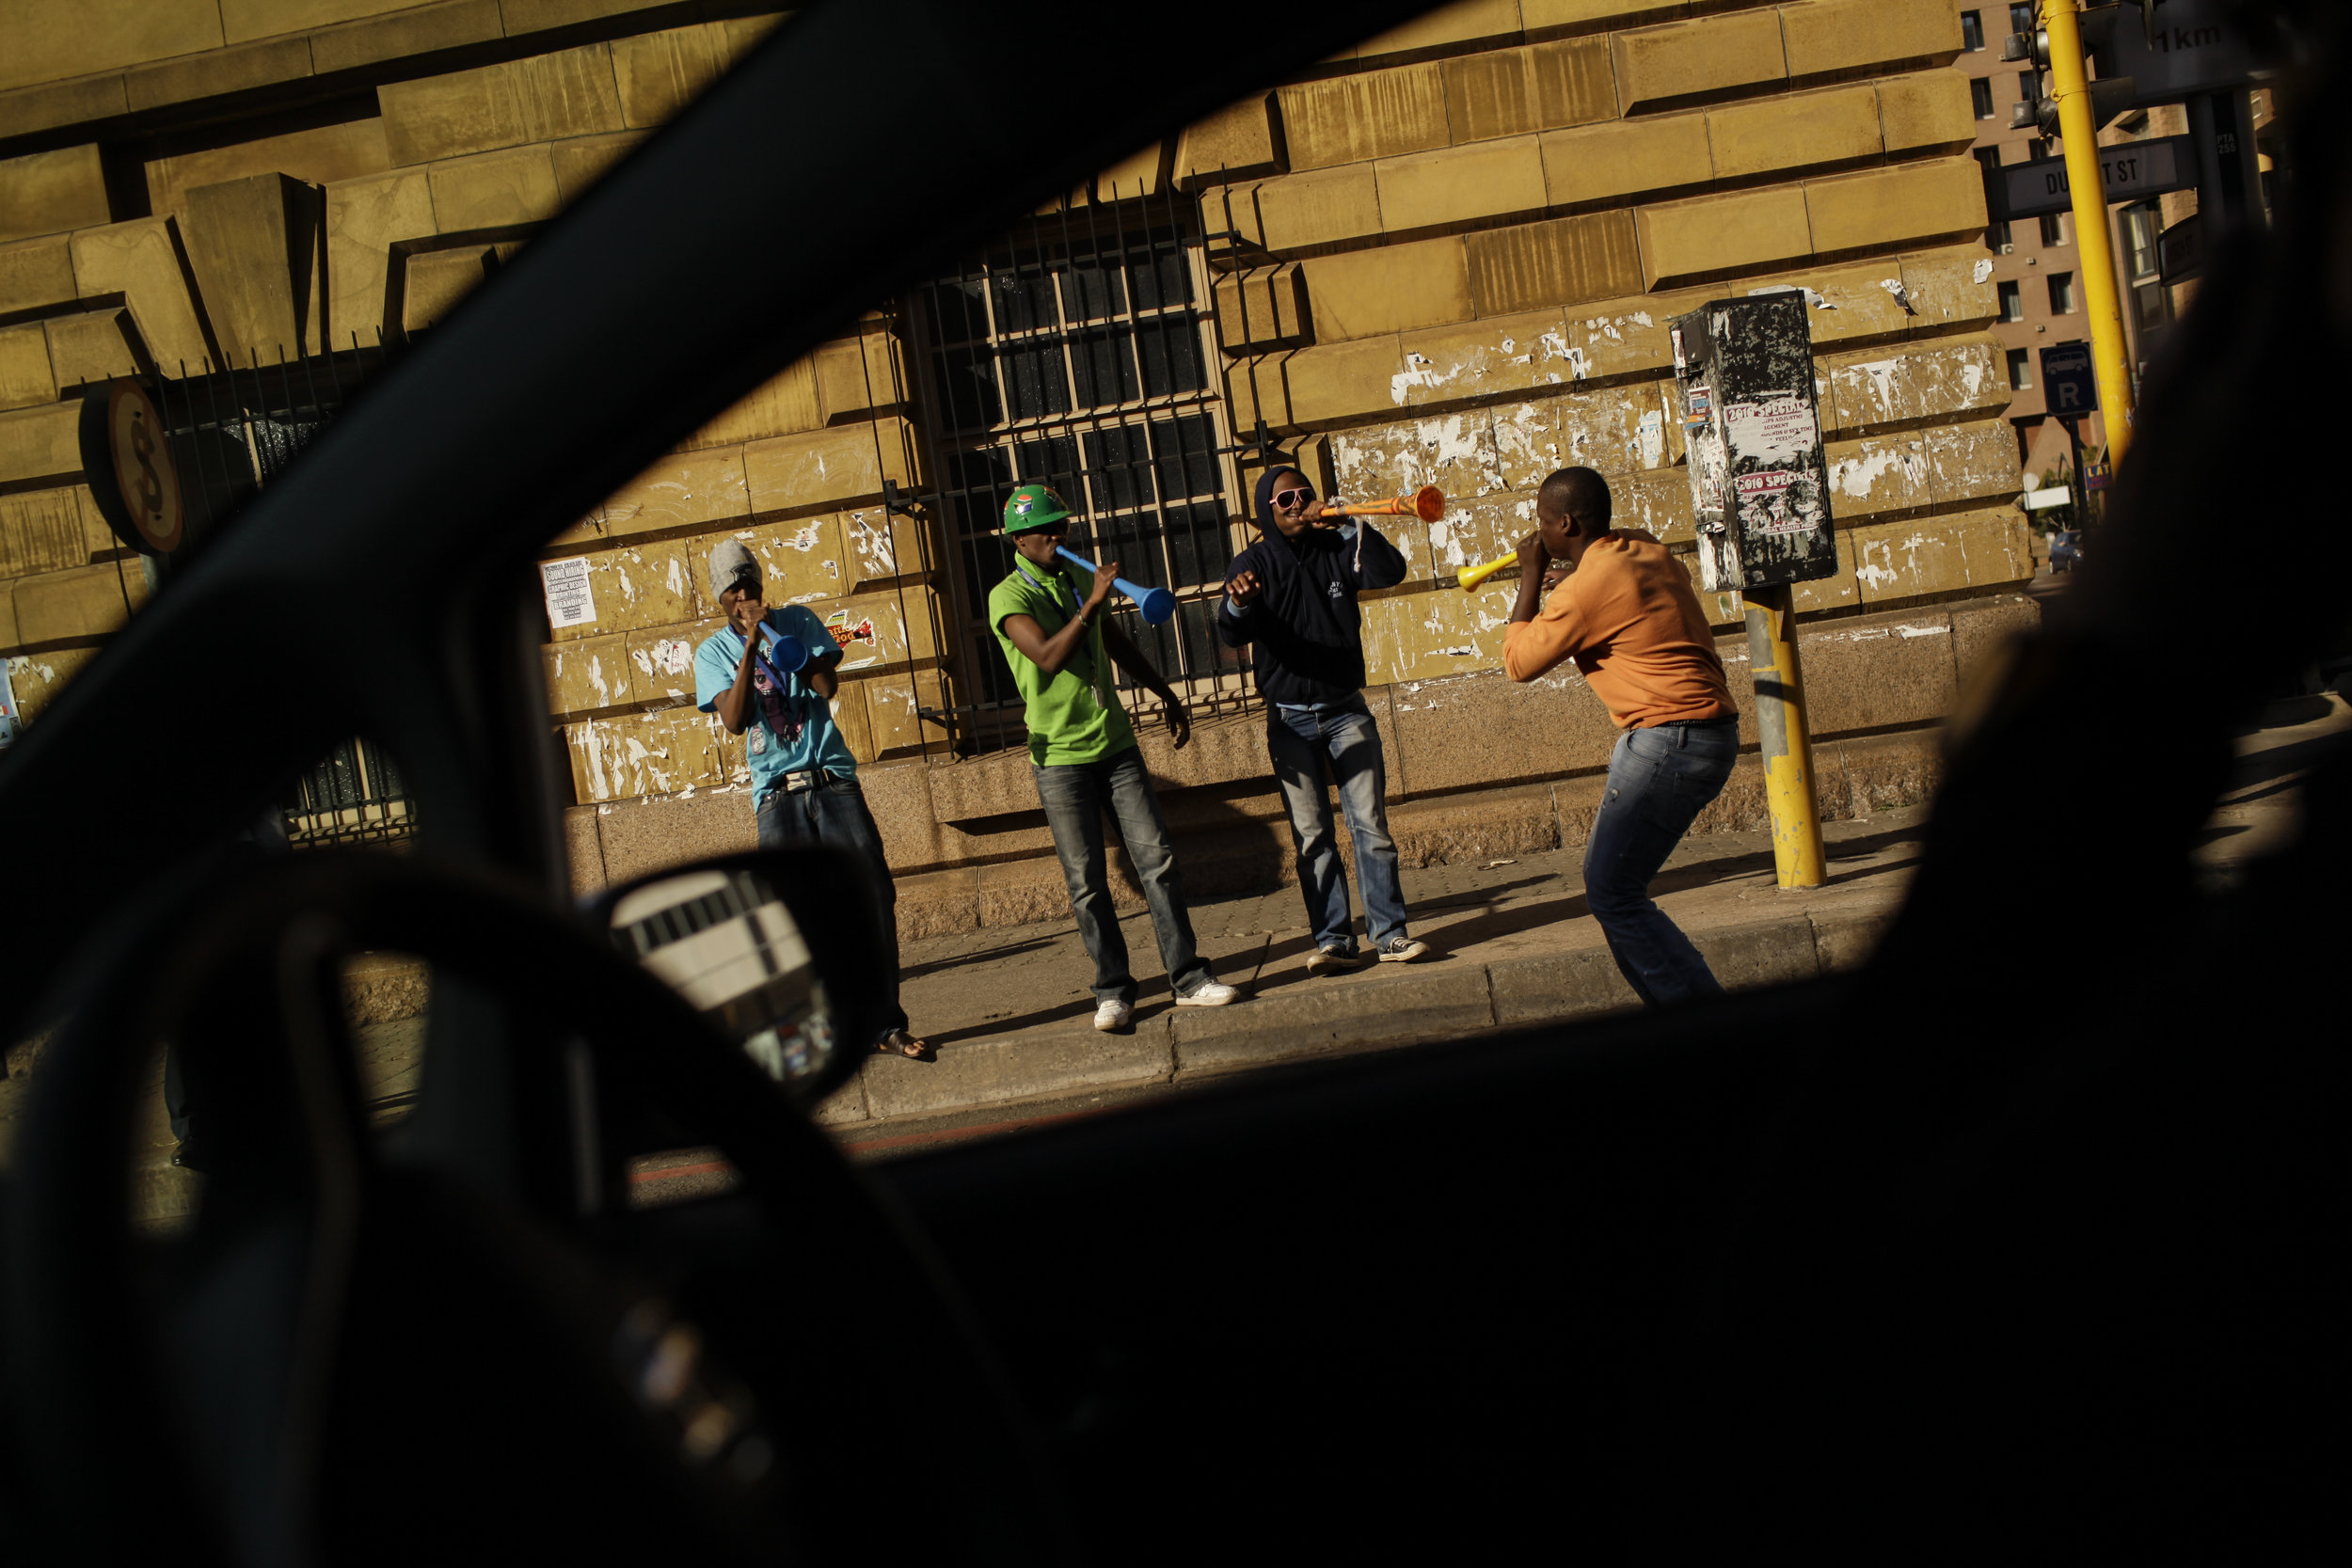 Soccer fans blow their vuvuzelas in downtown Pretoria, South Africa, Wednesday, June 16, 2010. (AP Photo/David Azia)